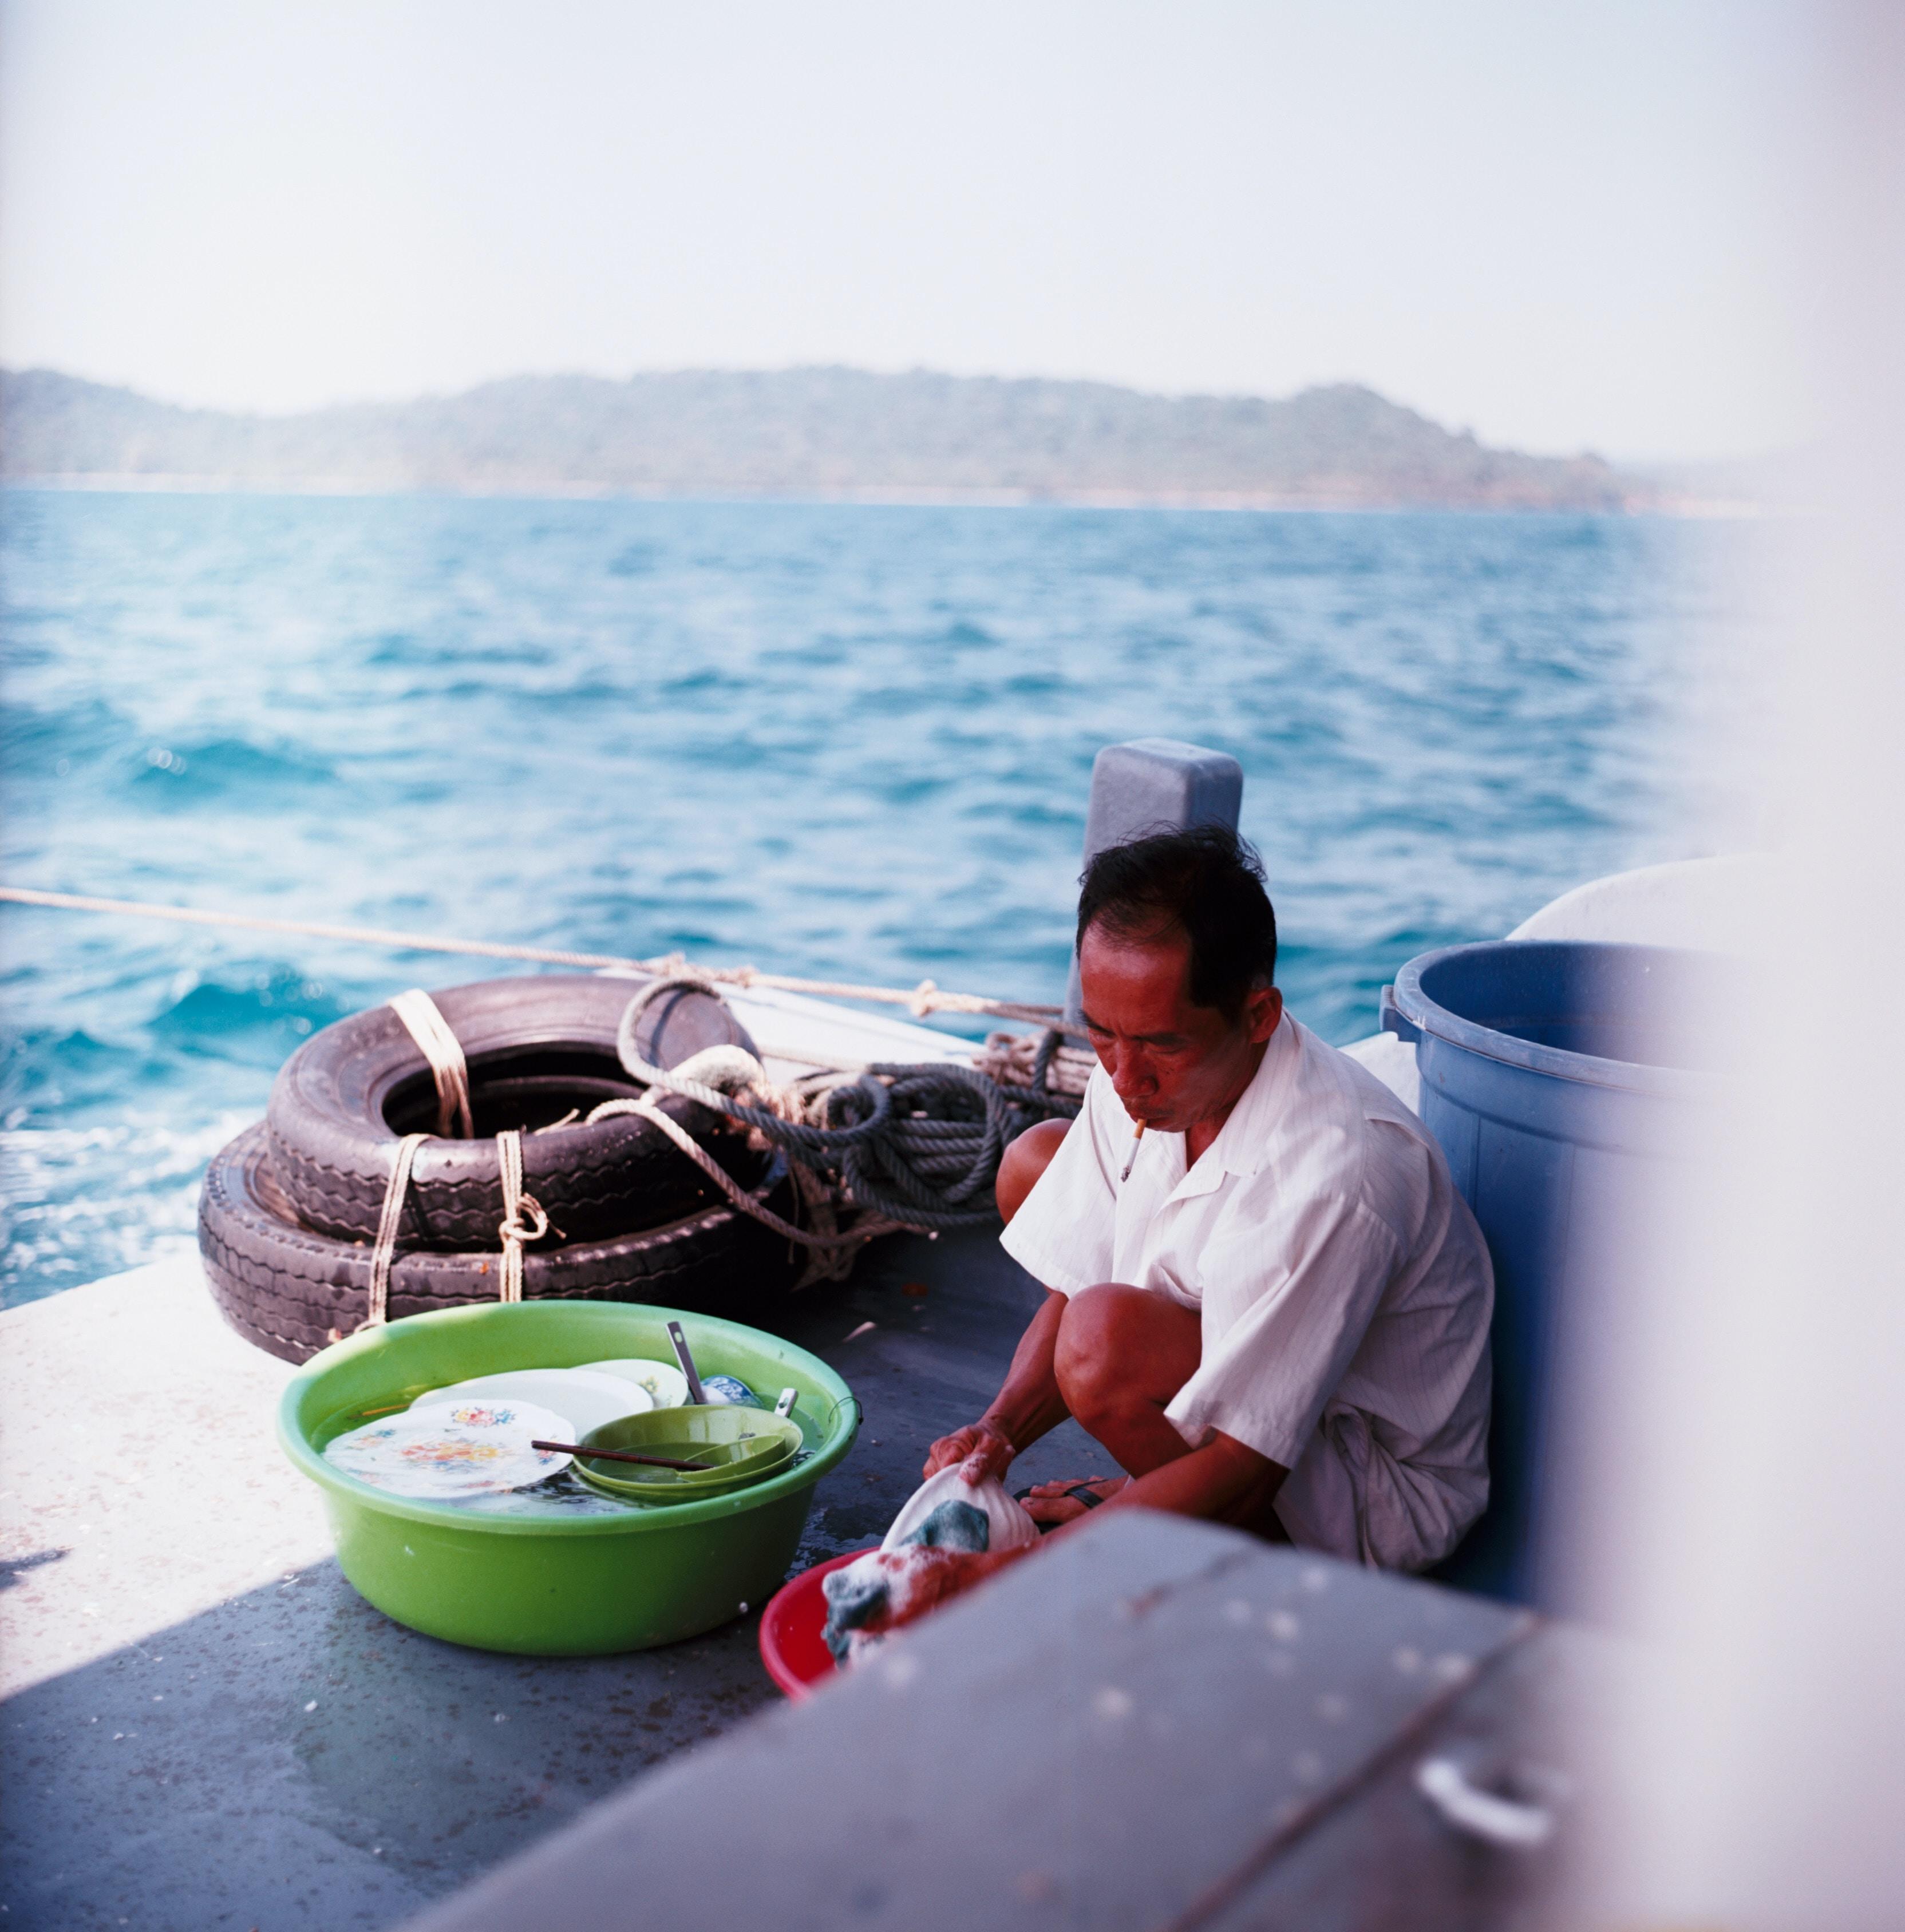 man washing dishes beside blue plastic pail